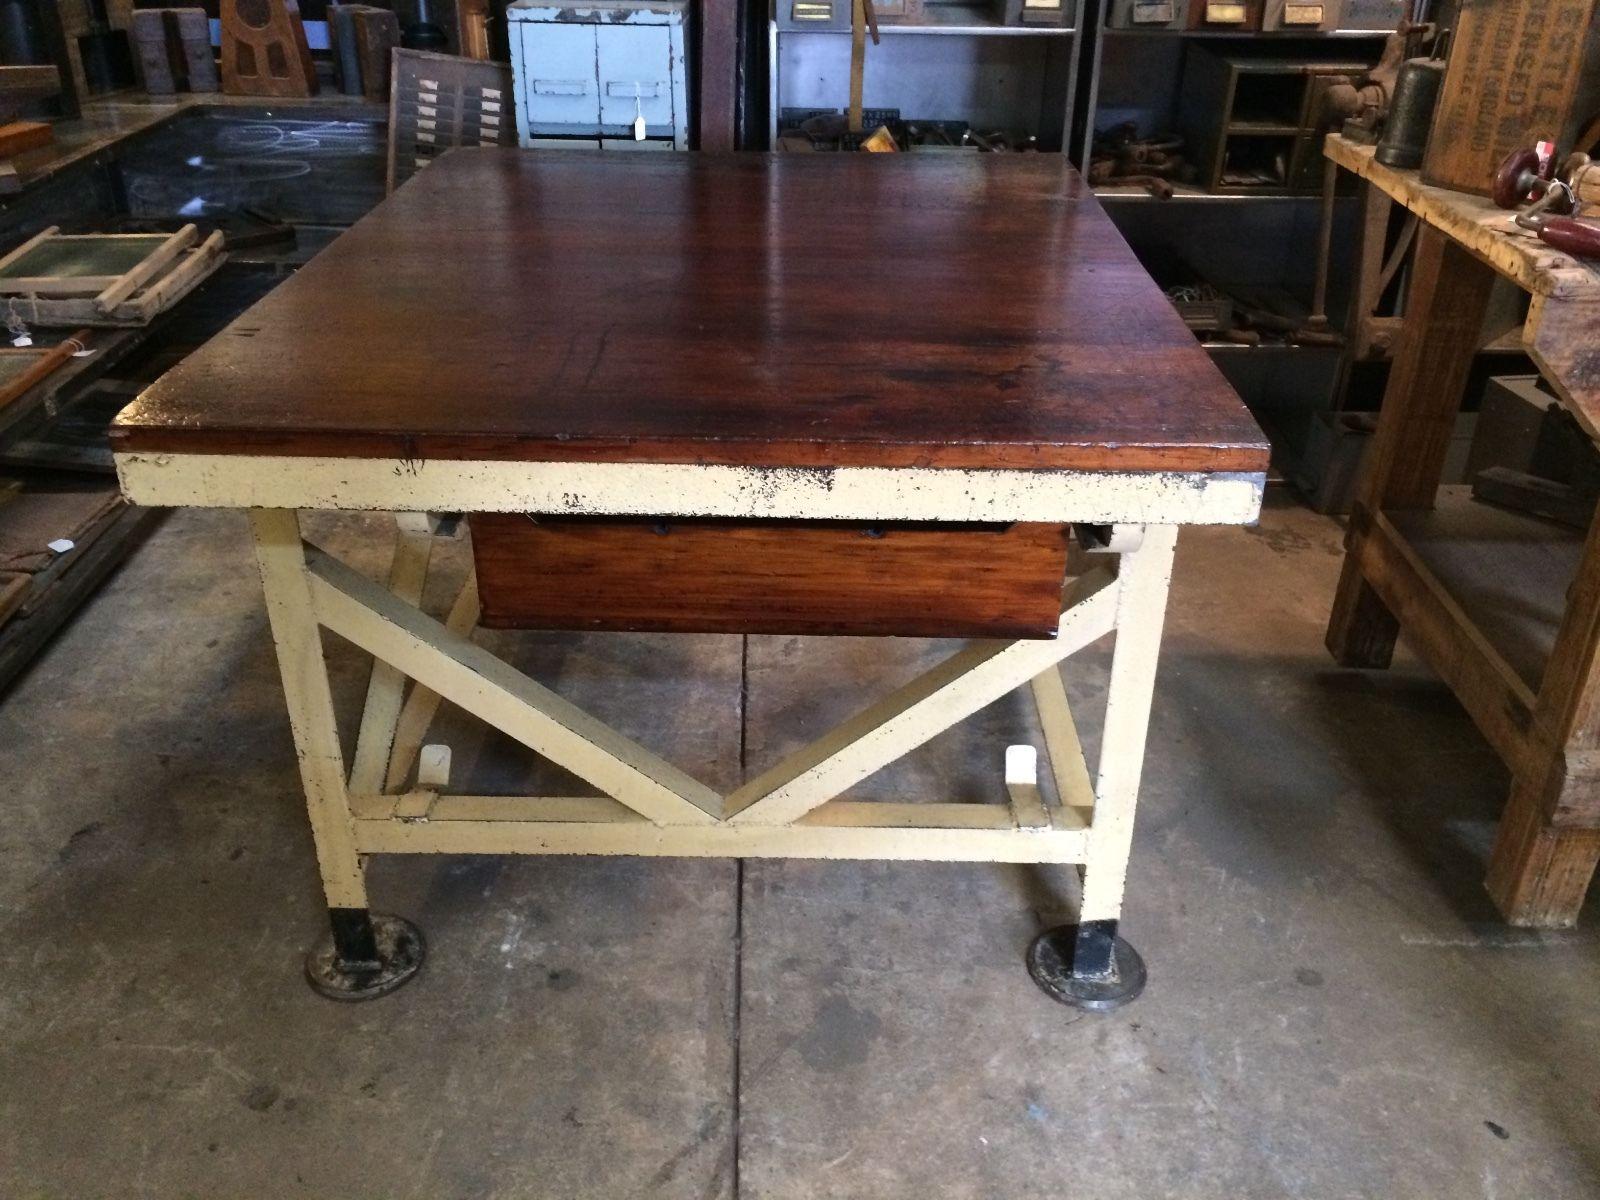 Vintage Industrial Rustic Table Work Bench Halsey Road